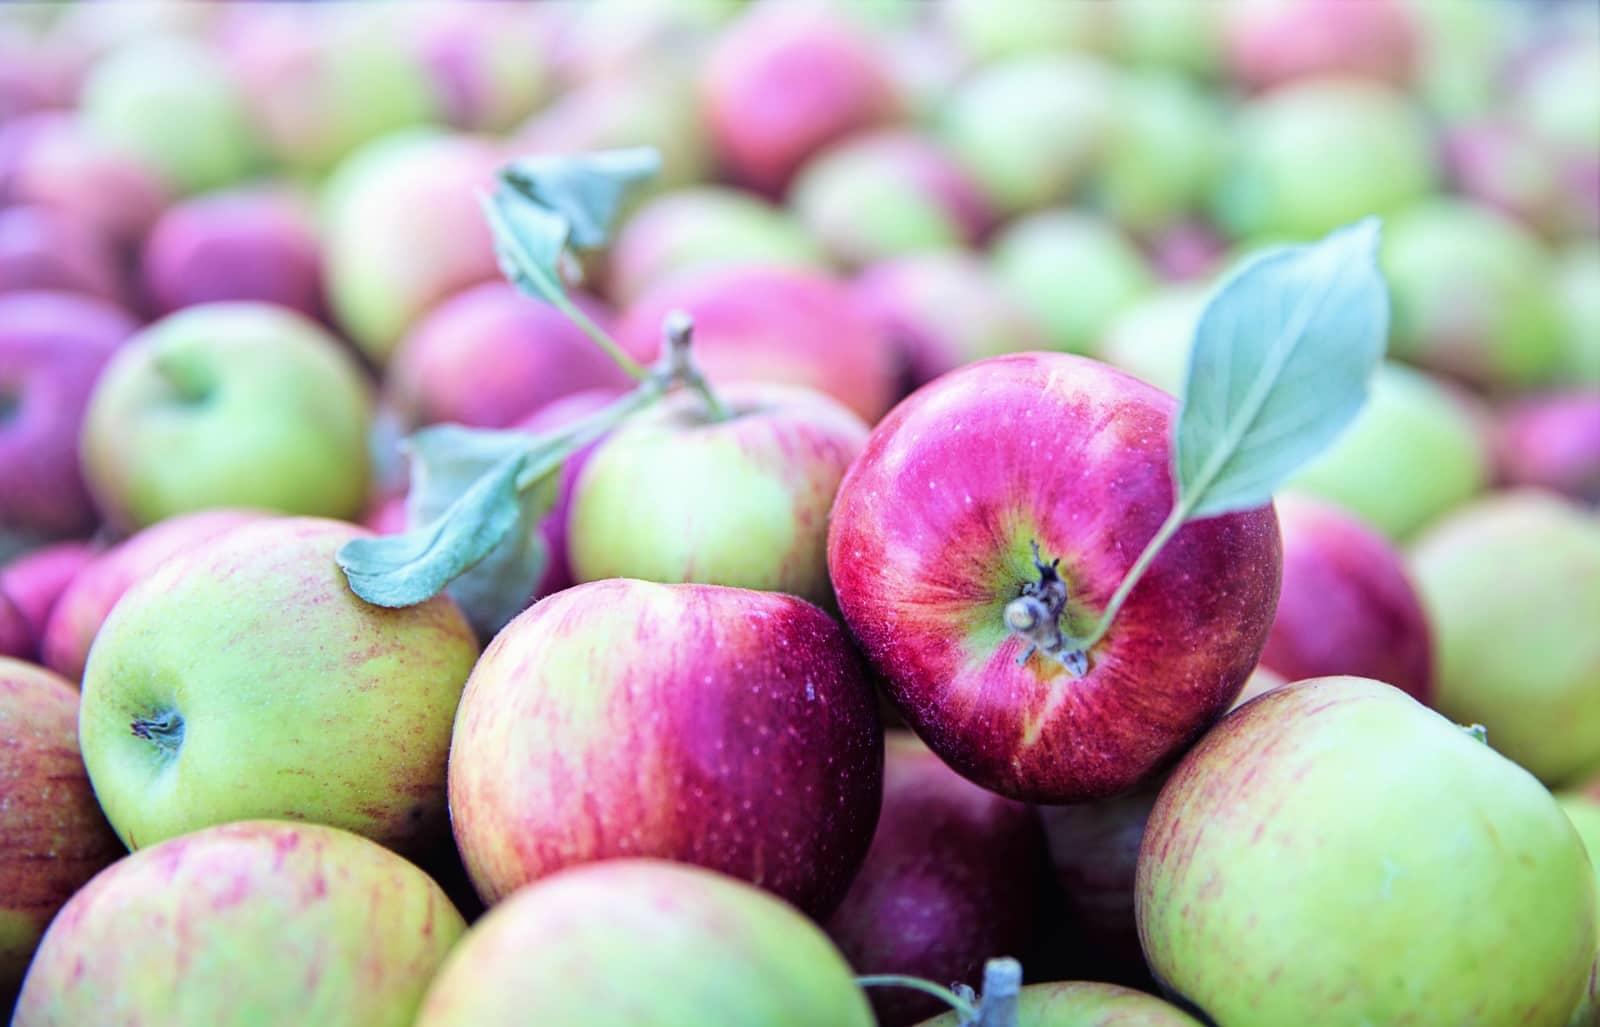 Jill Wellington via Pixabay - groen paarse appels